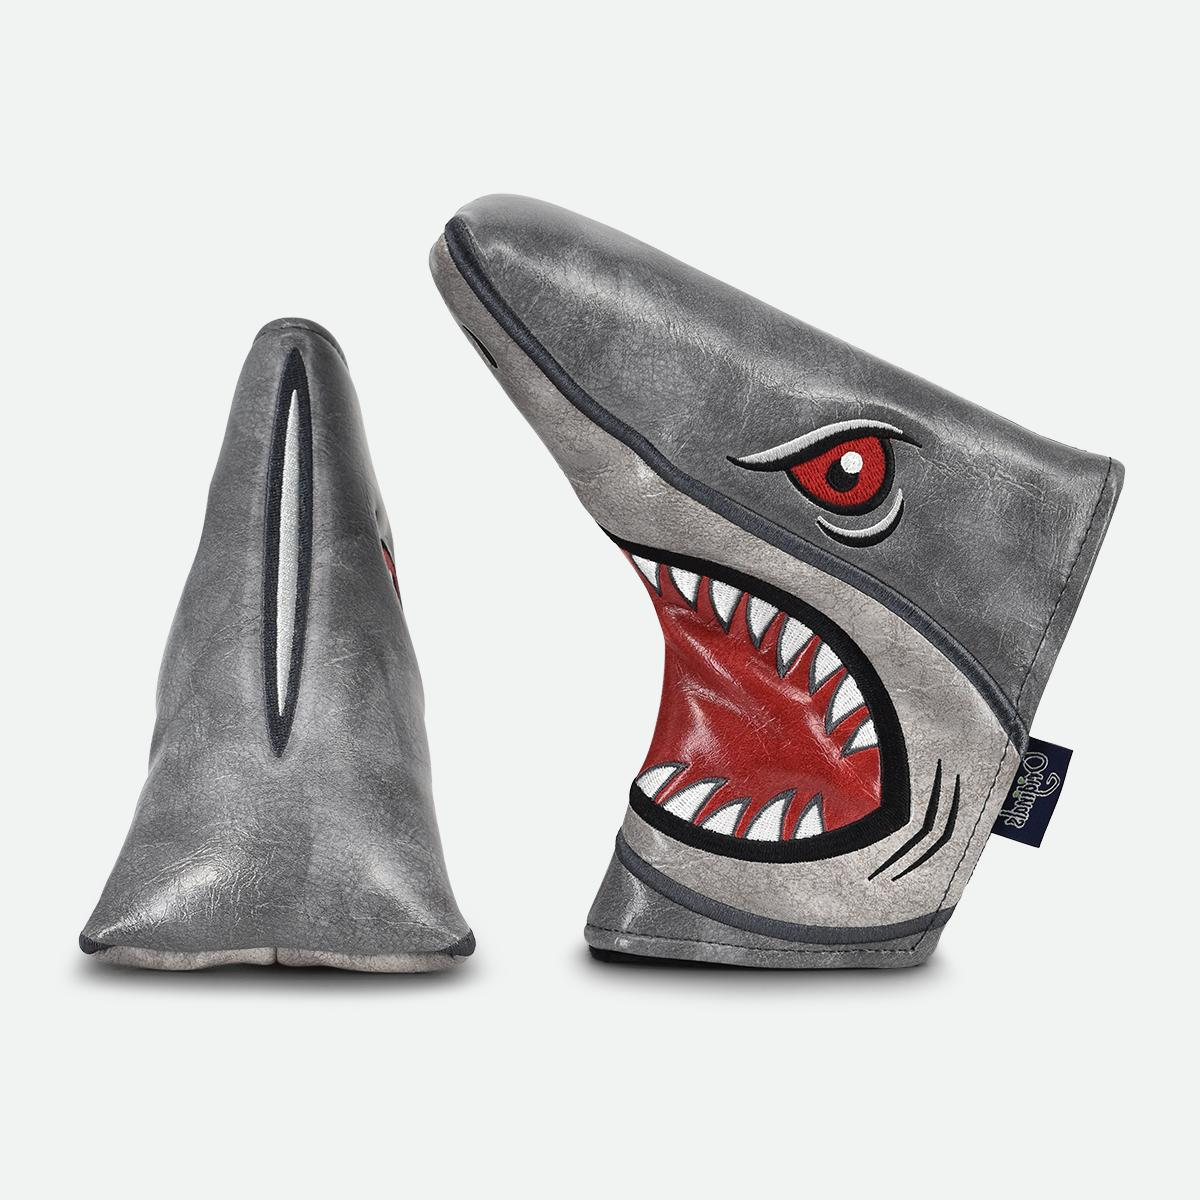 prg originals shark attack blade putter cover